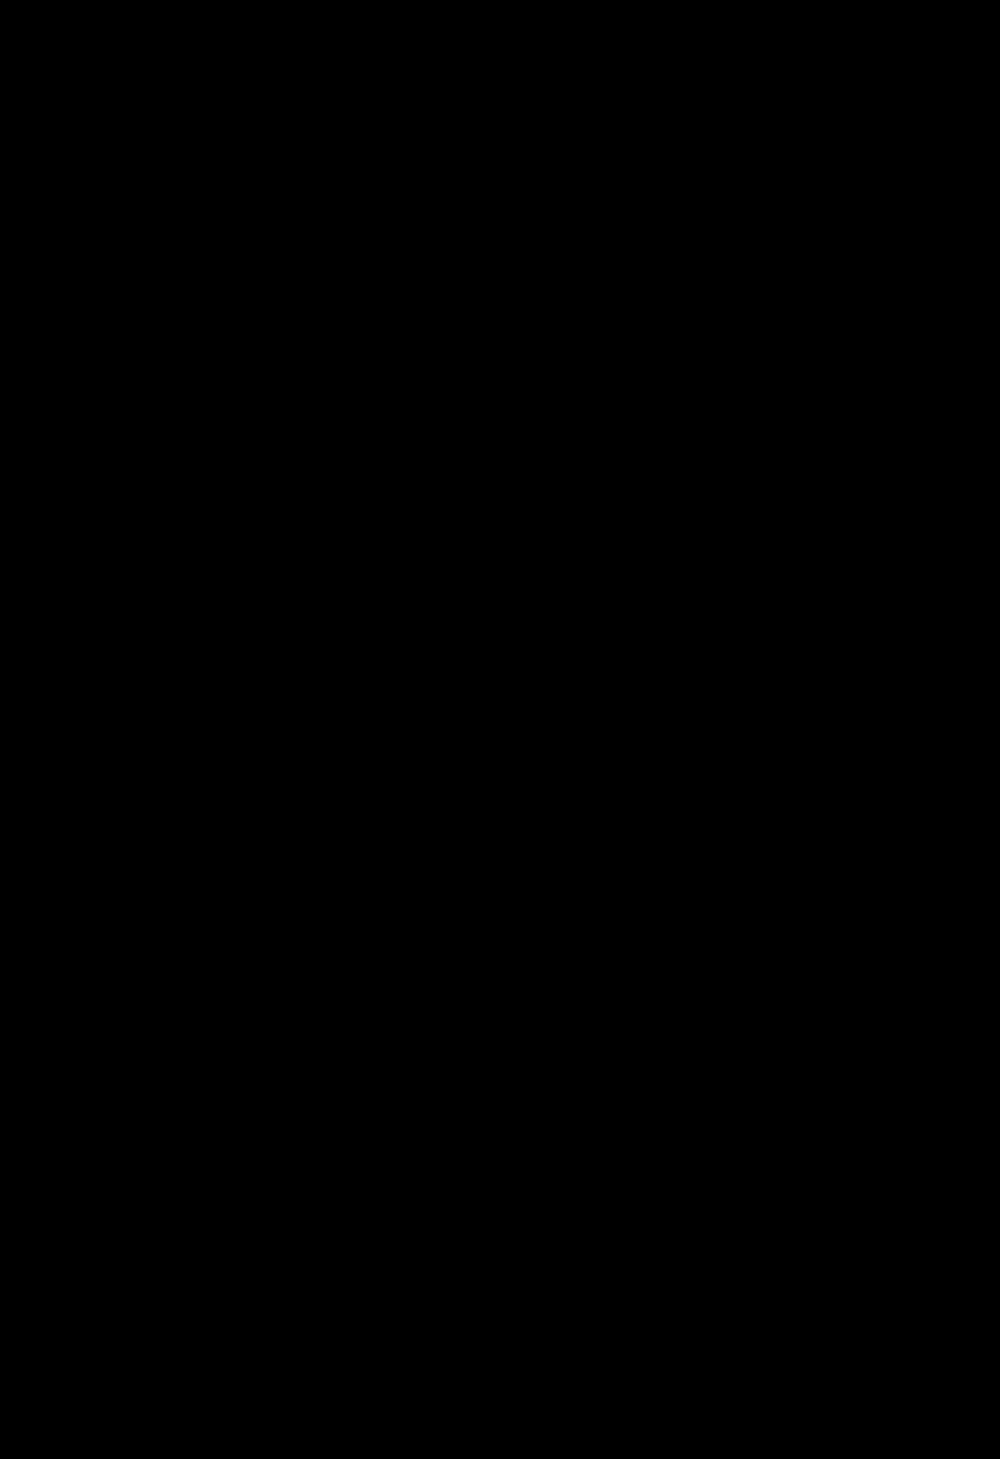 WCM0012.png